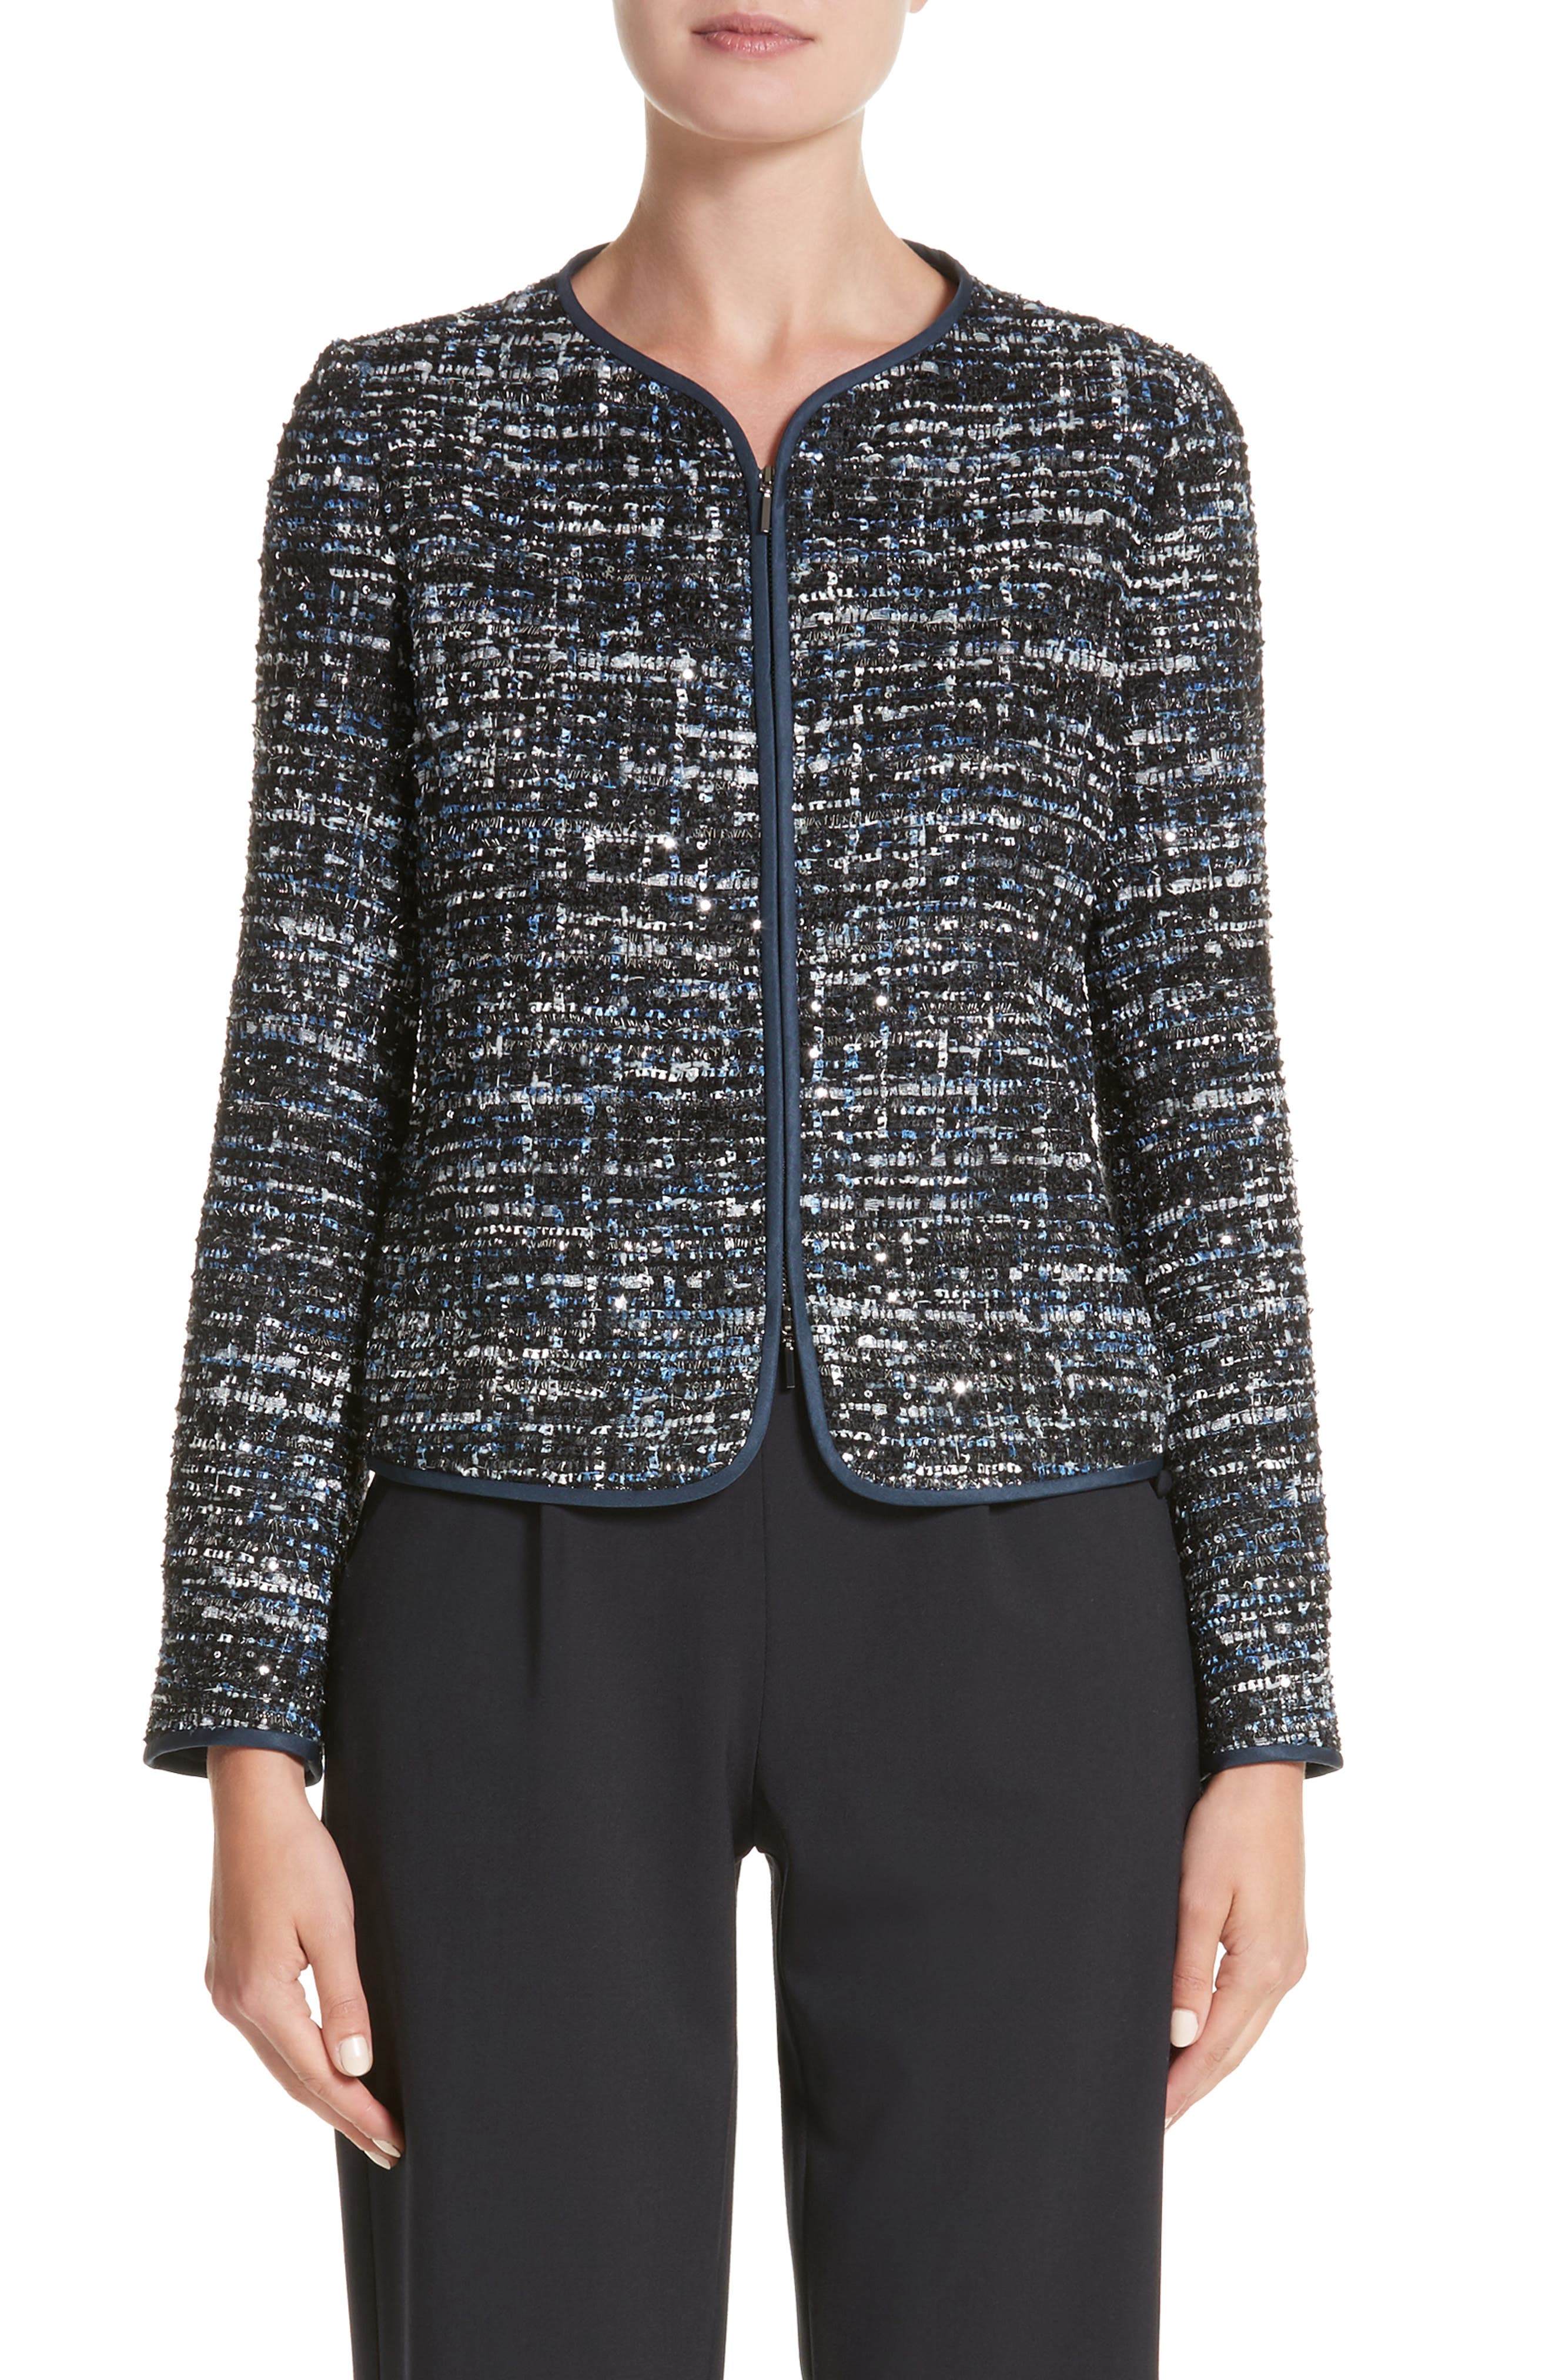 Main Image - Armani Collezioni Sequin Tweed Jacket